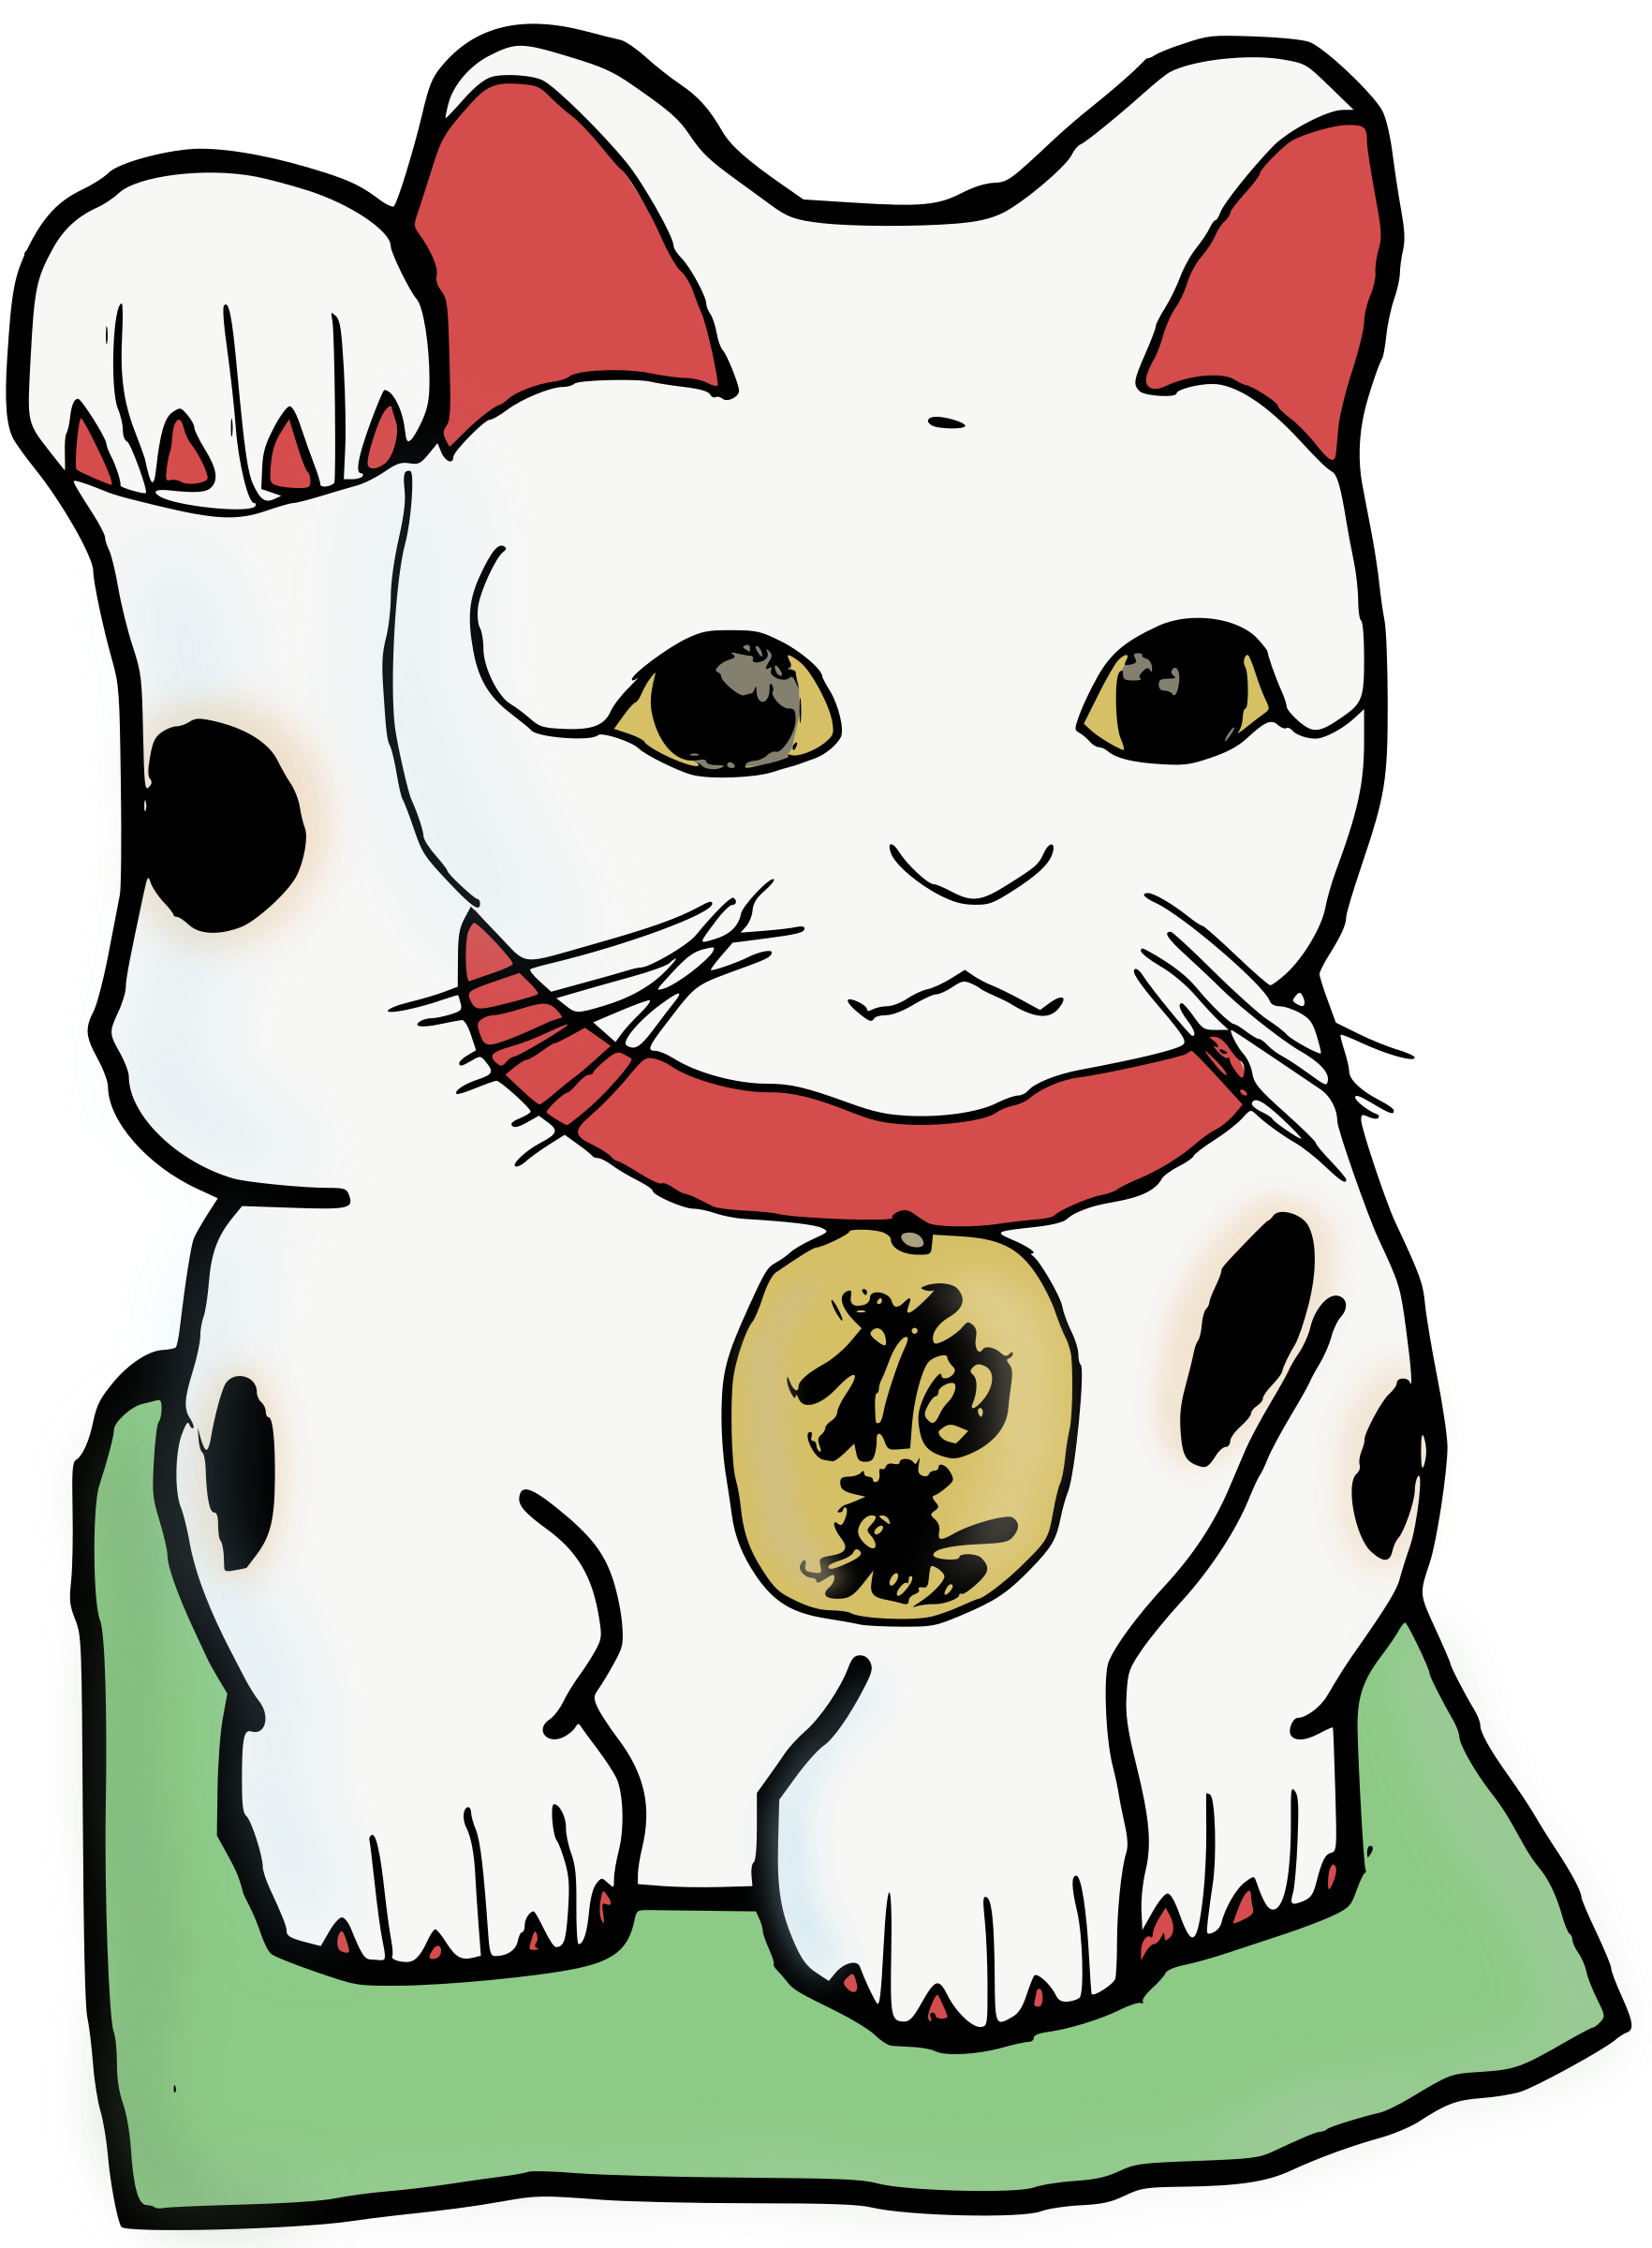 Clipart cat with money graphic black and white download Clipart - Maneki Neko - Colour graphic black and white download